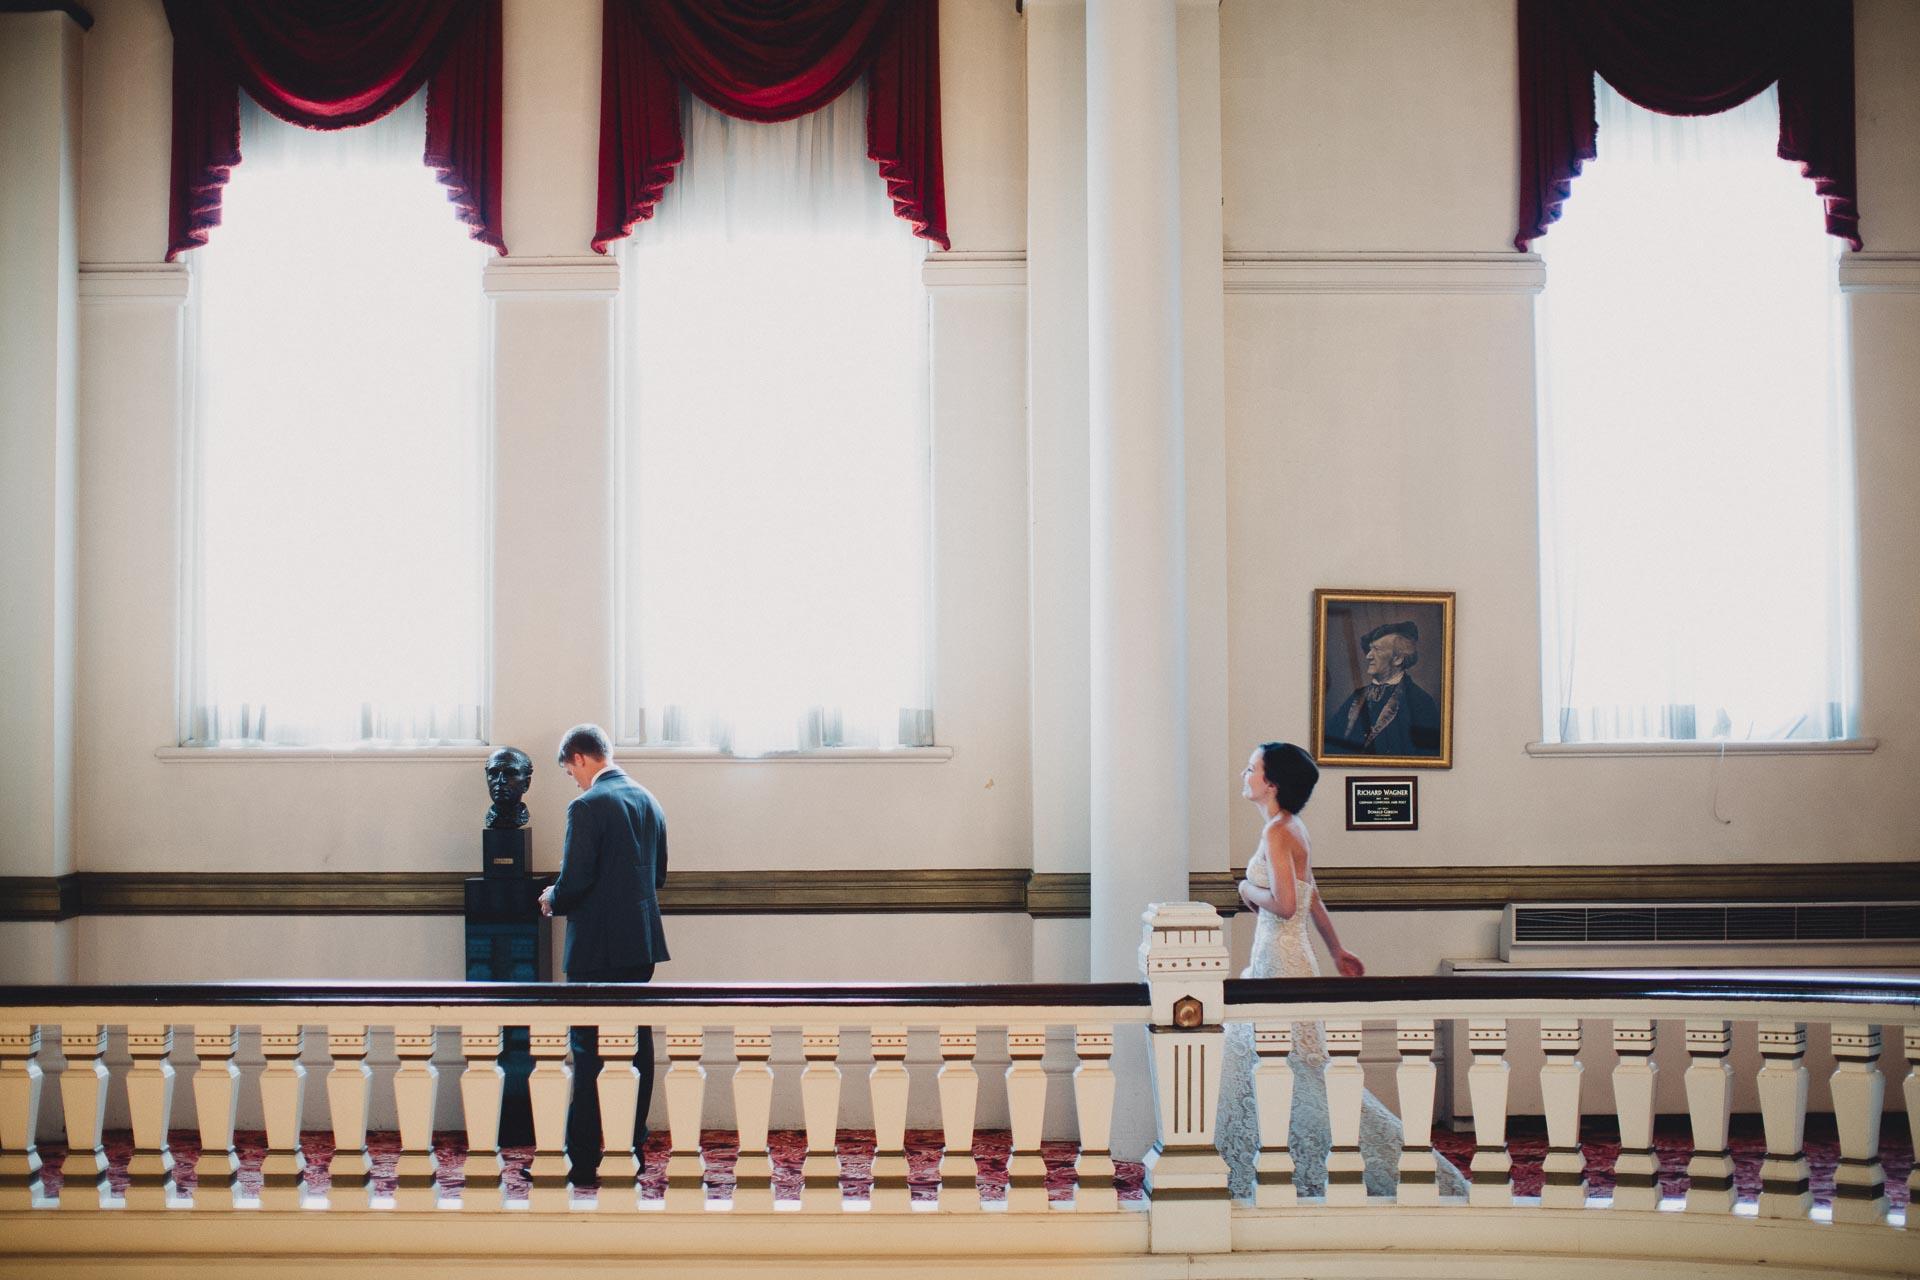 Julia-Michael-Cincinnati-Music-Hall-Wedding-043@2x.jpg